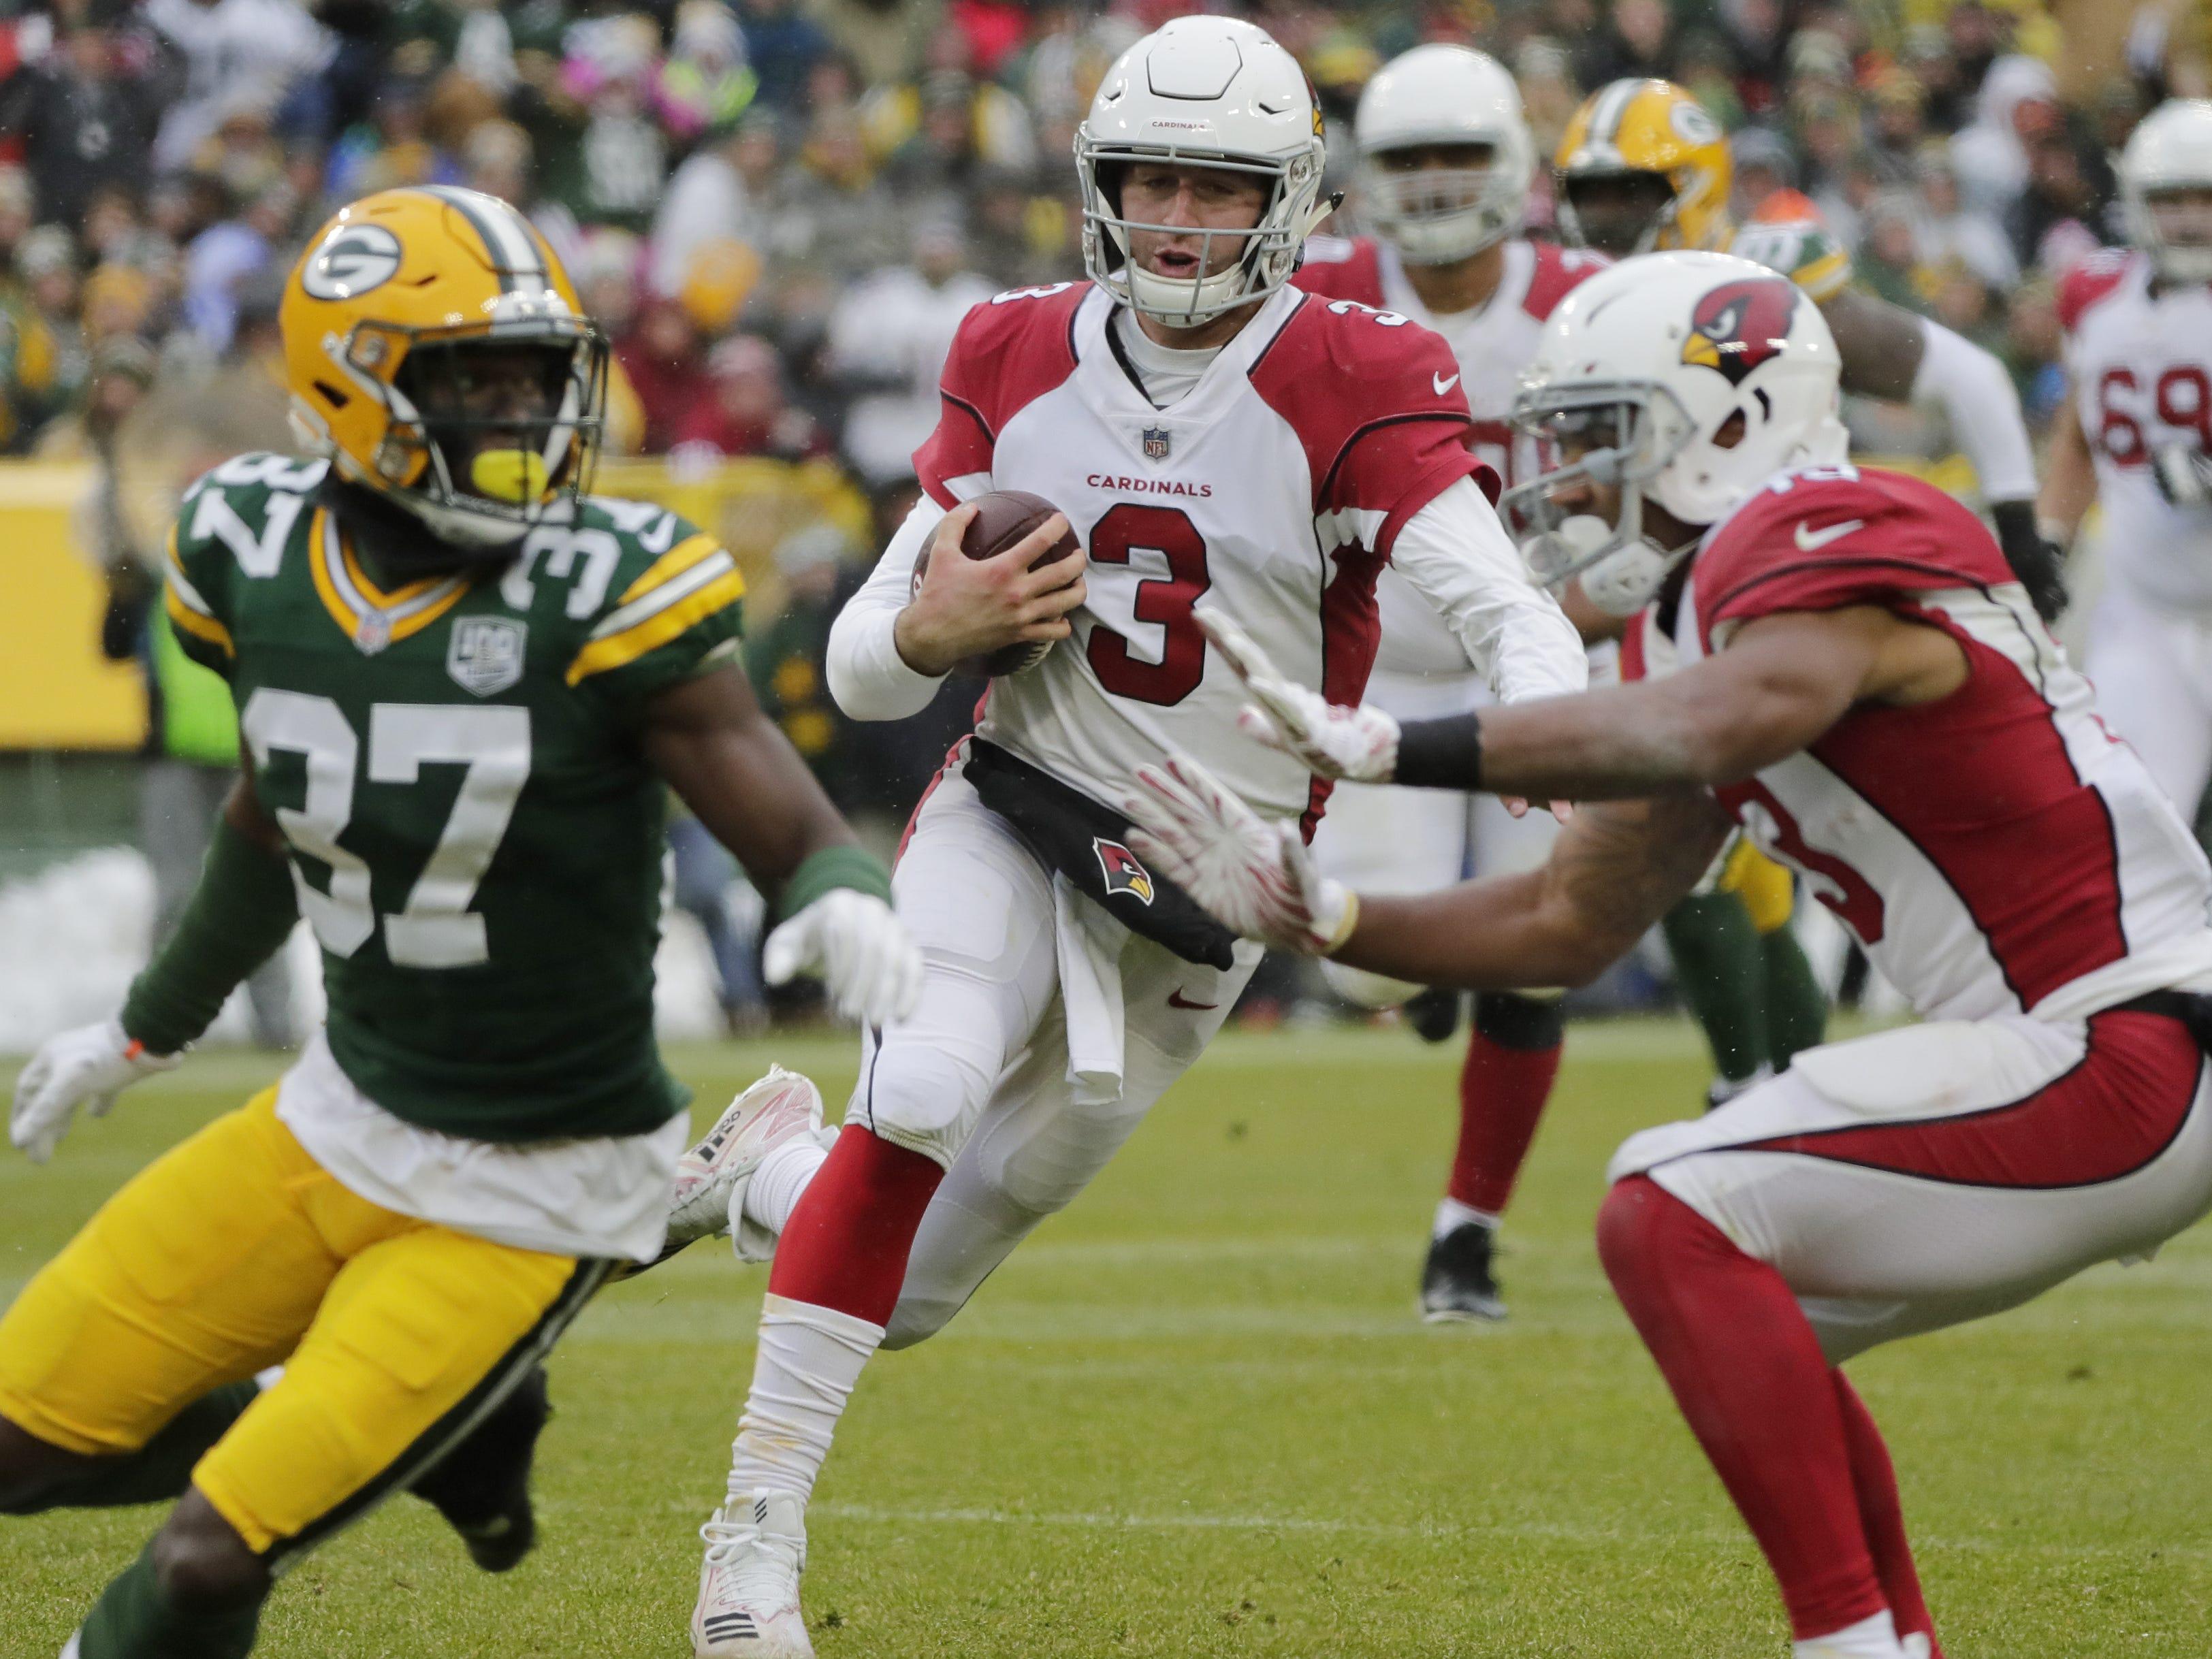 Arizona Cardinals quarterback Josh Rosen (3) scrambles in the third quarter against the Green Bay Packers at Lambeau Field on Sunday, December 2, 2018 in Green Bay, Wis.